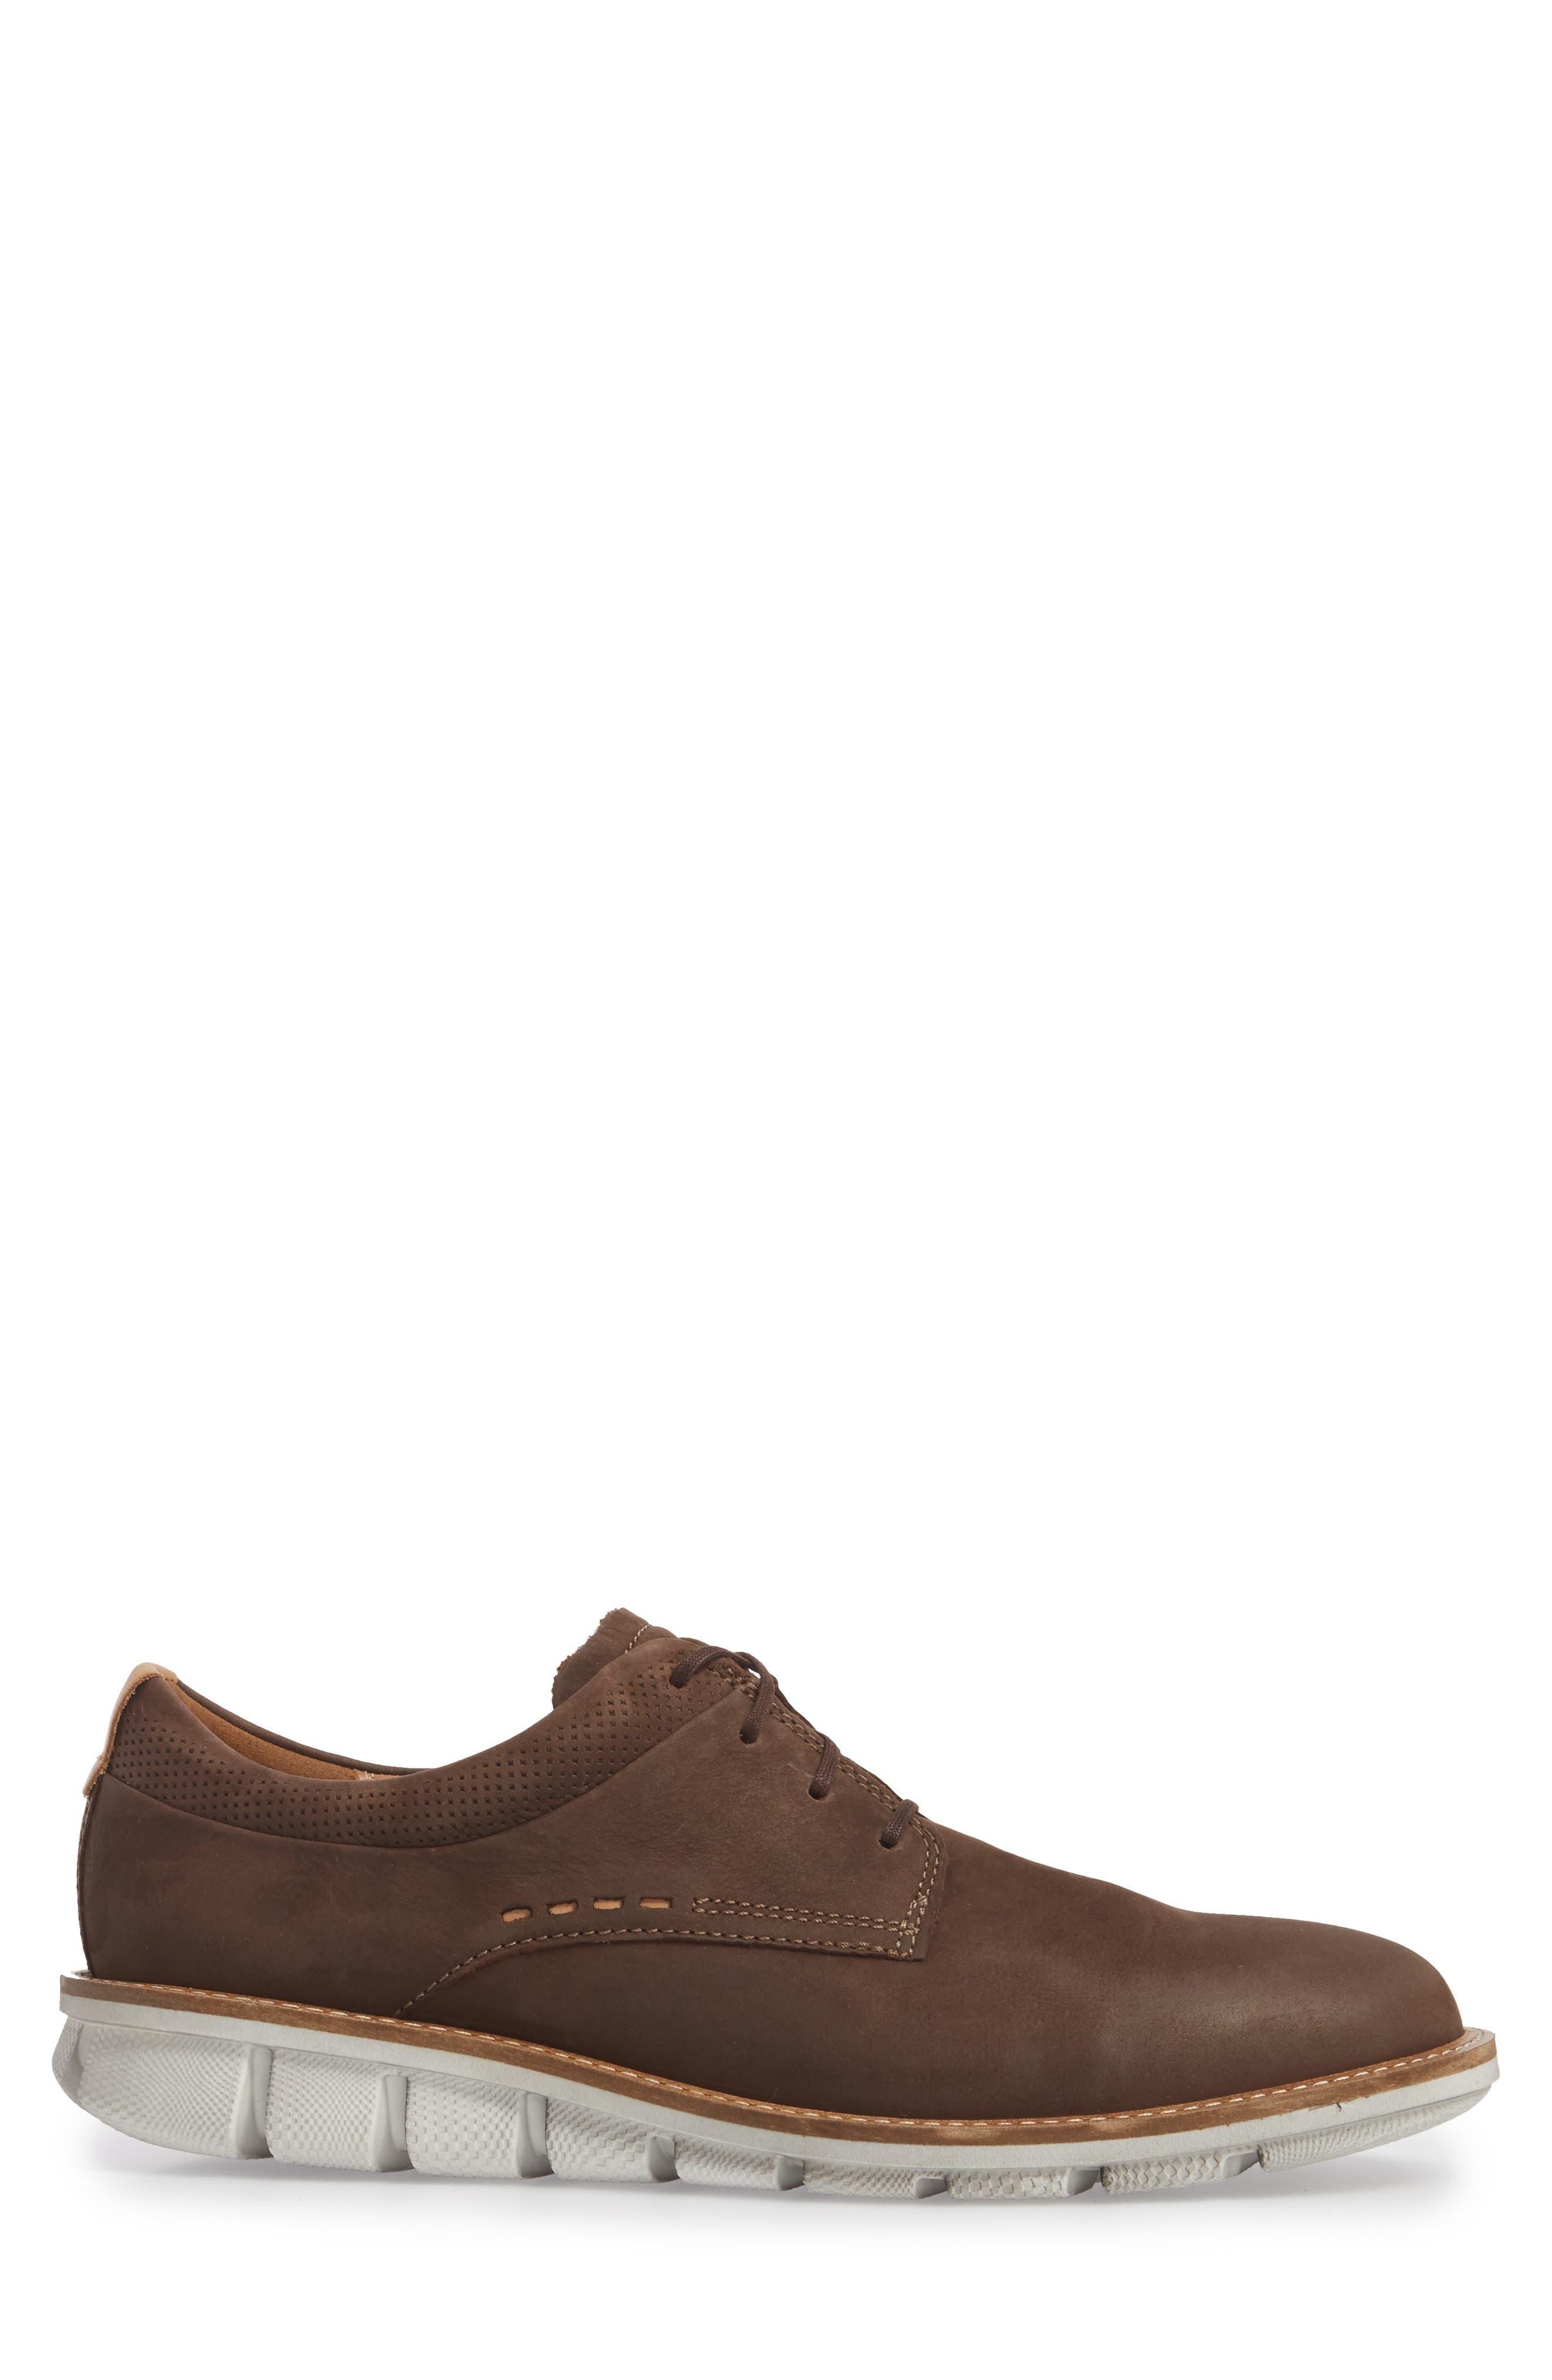 Jeremy Hybrid Plain Toe Derby,                             Alternate thumbnail 3, color,                             Coffee Leather